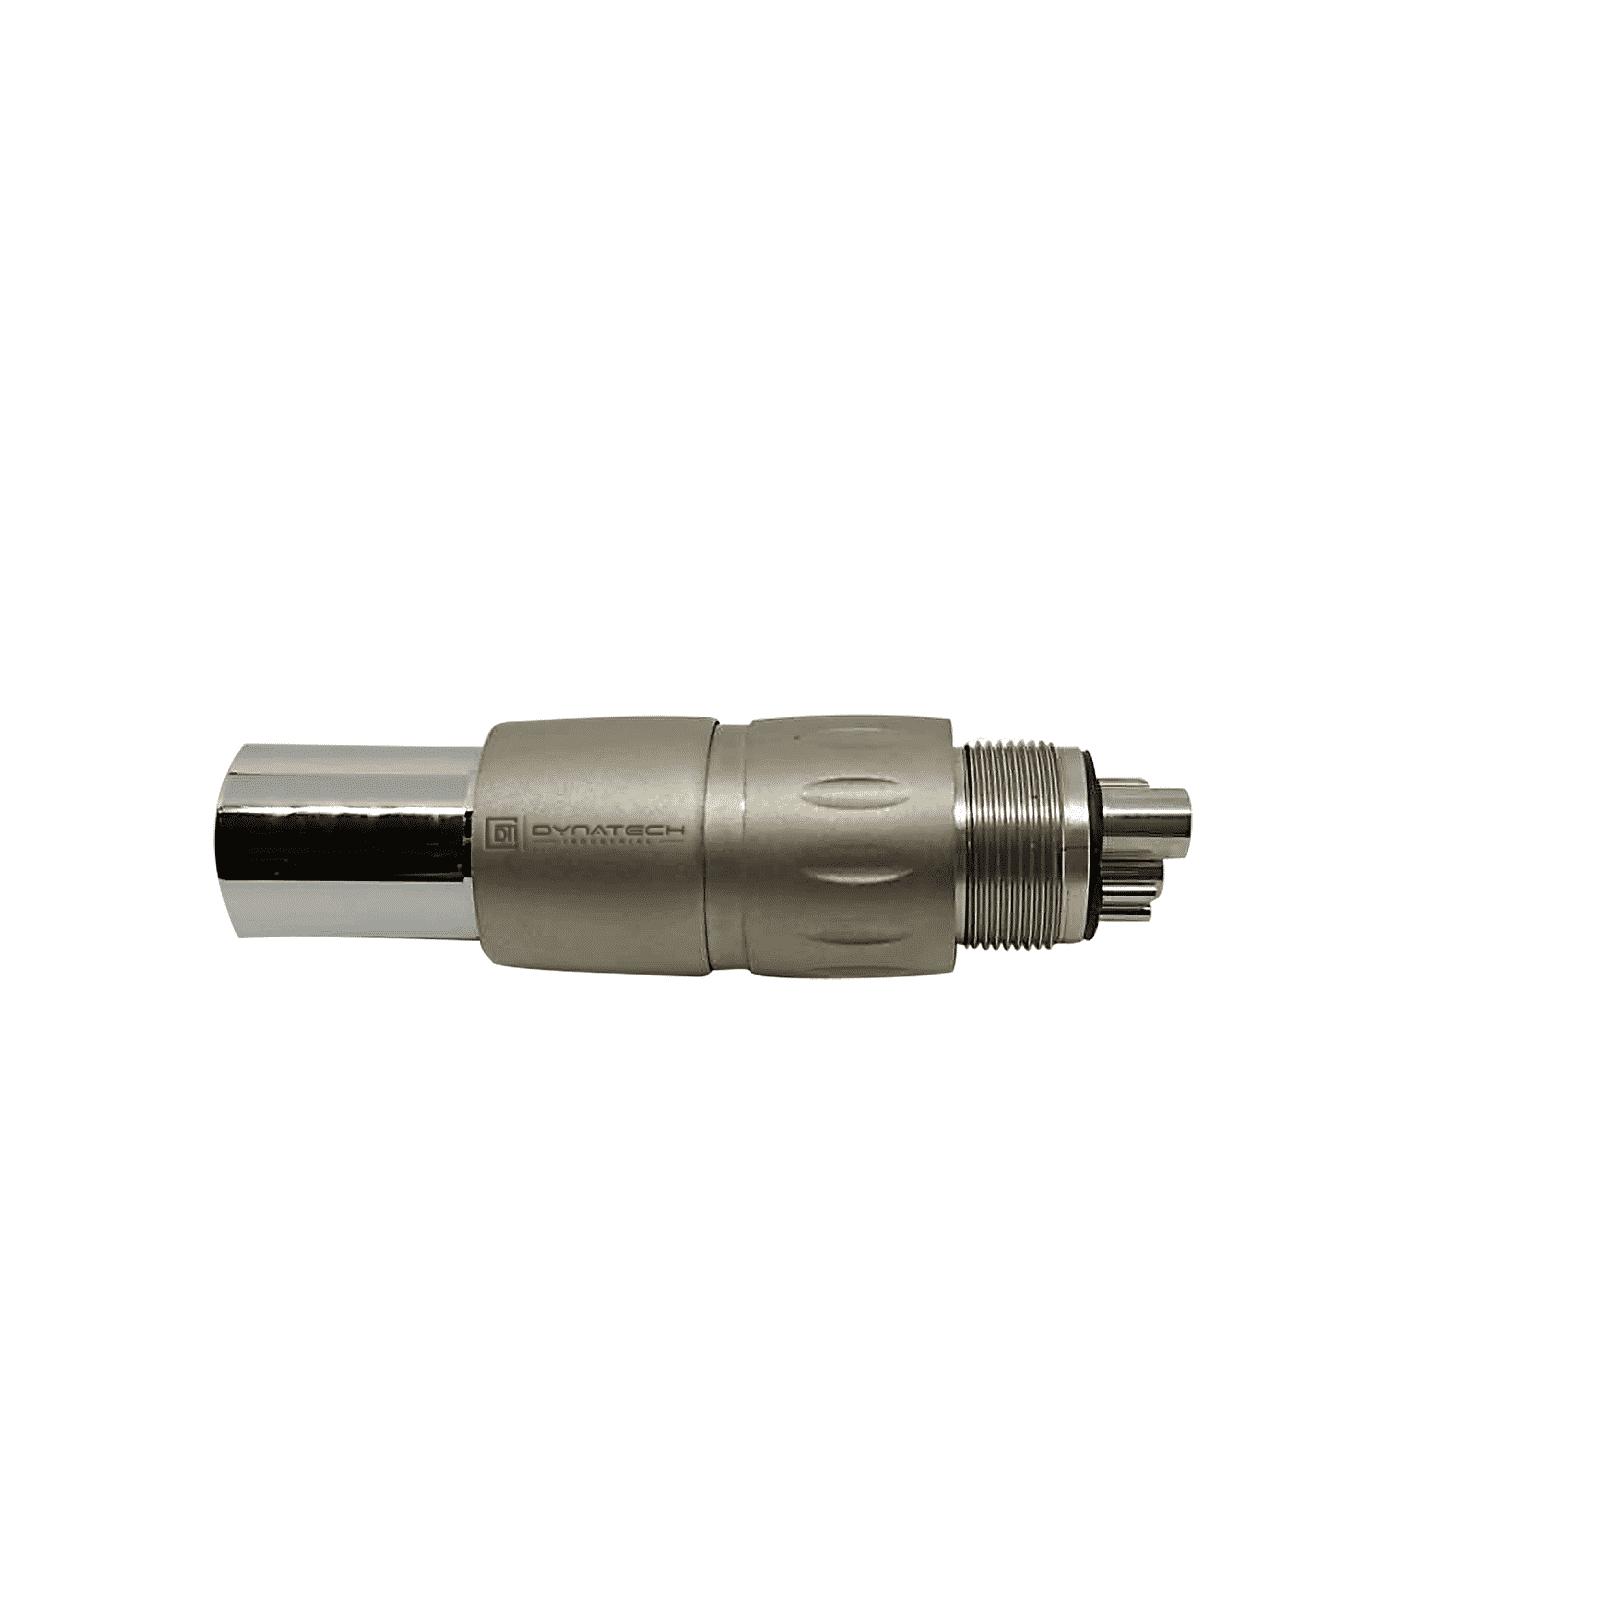 Premium Handpiece Coupler 100% Compatible 5